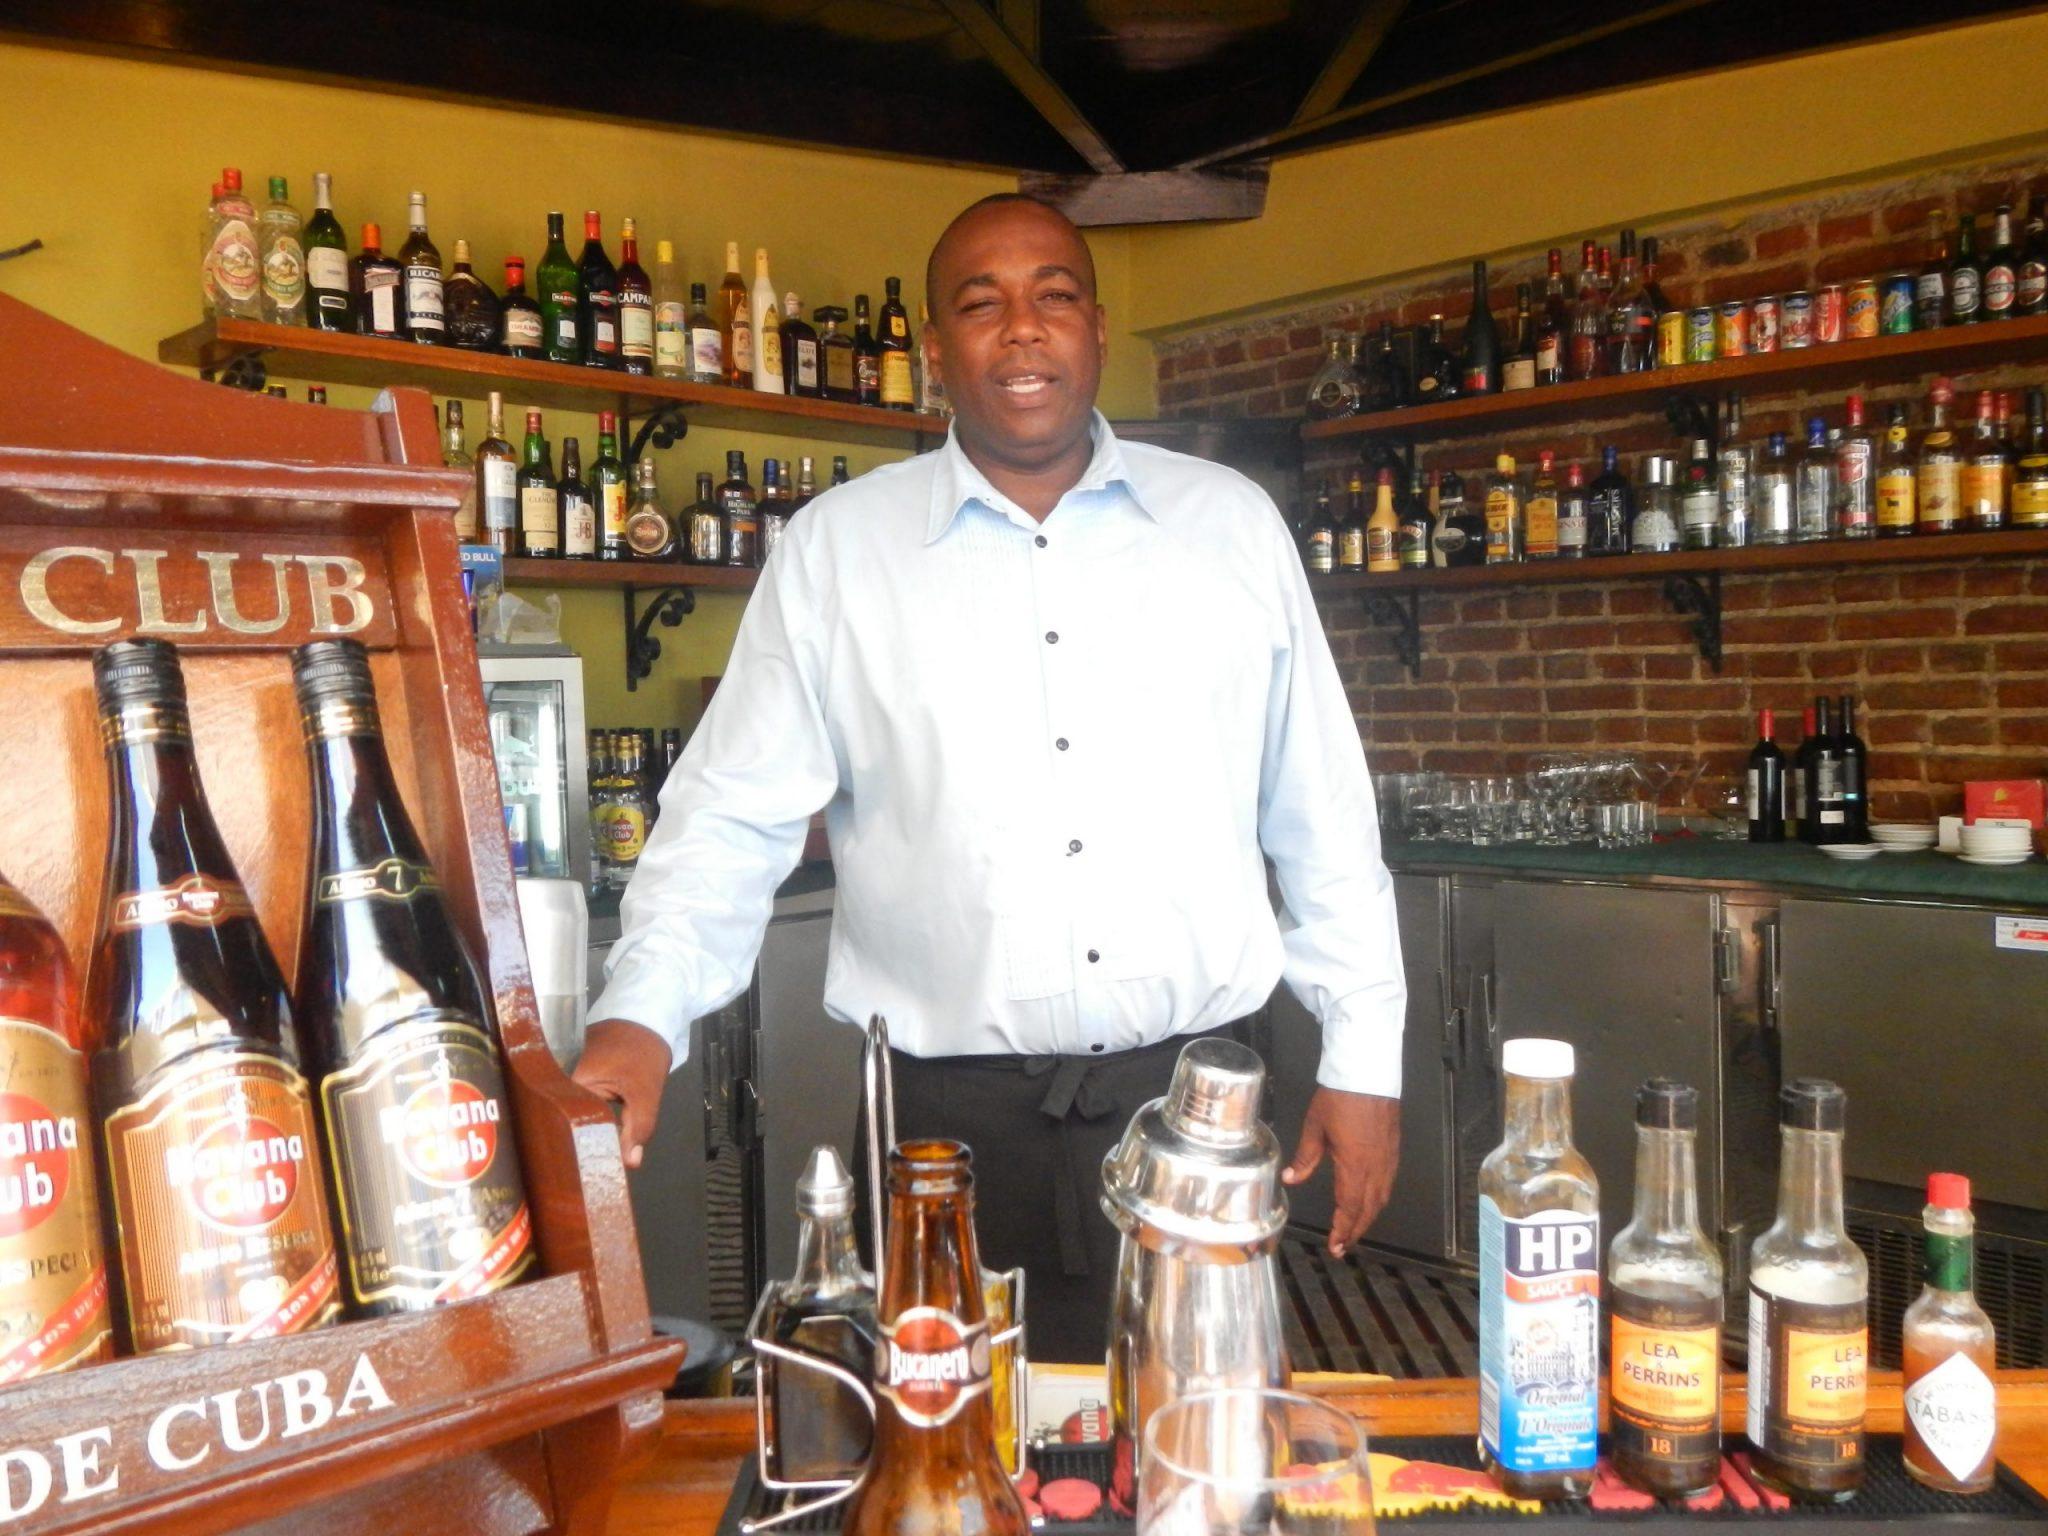 The Havana Club Rum Museum